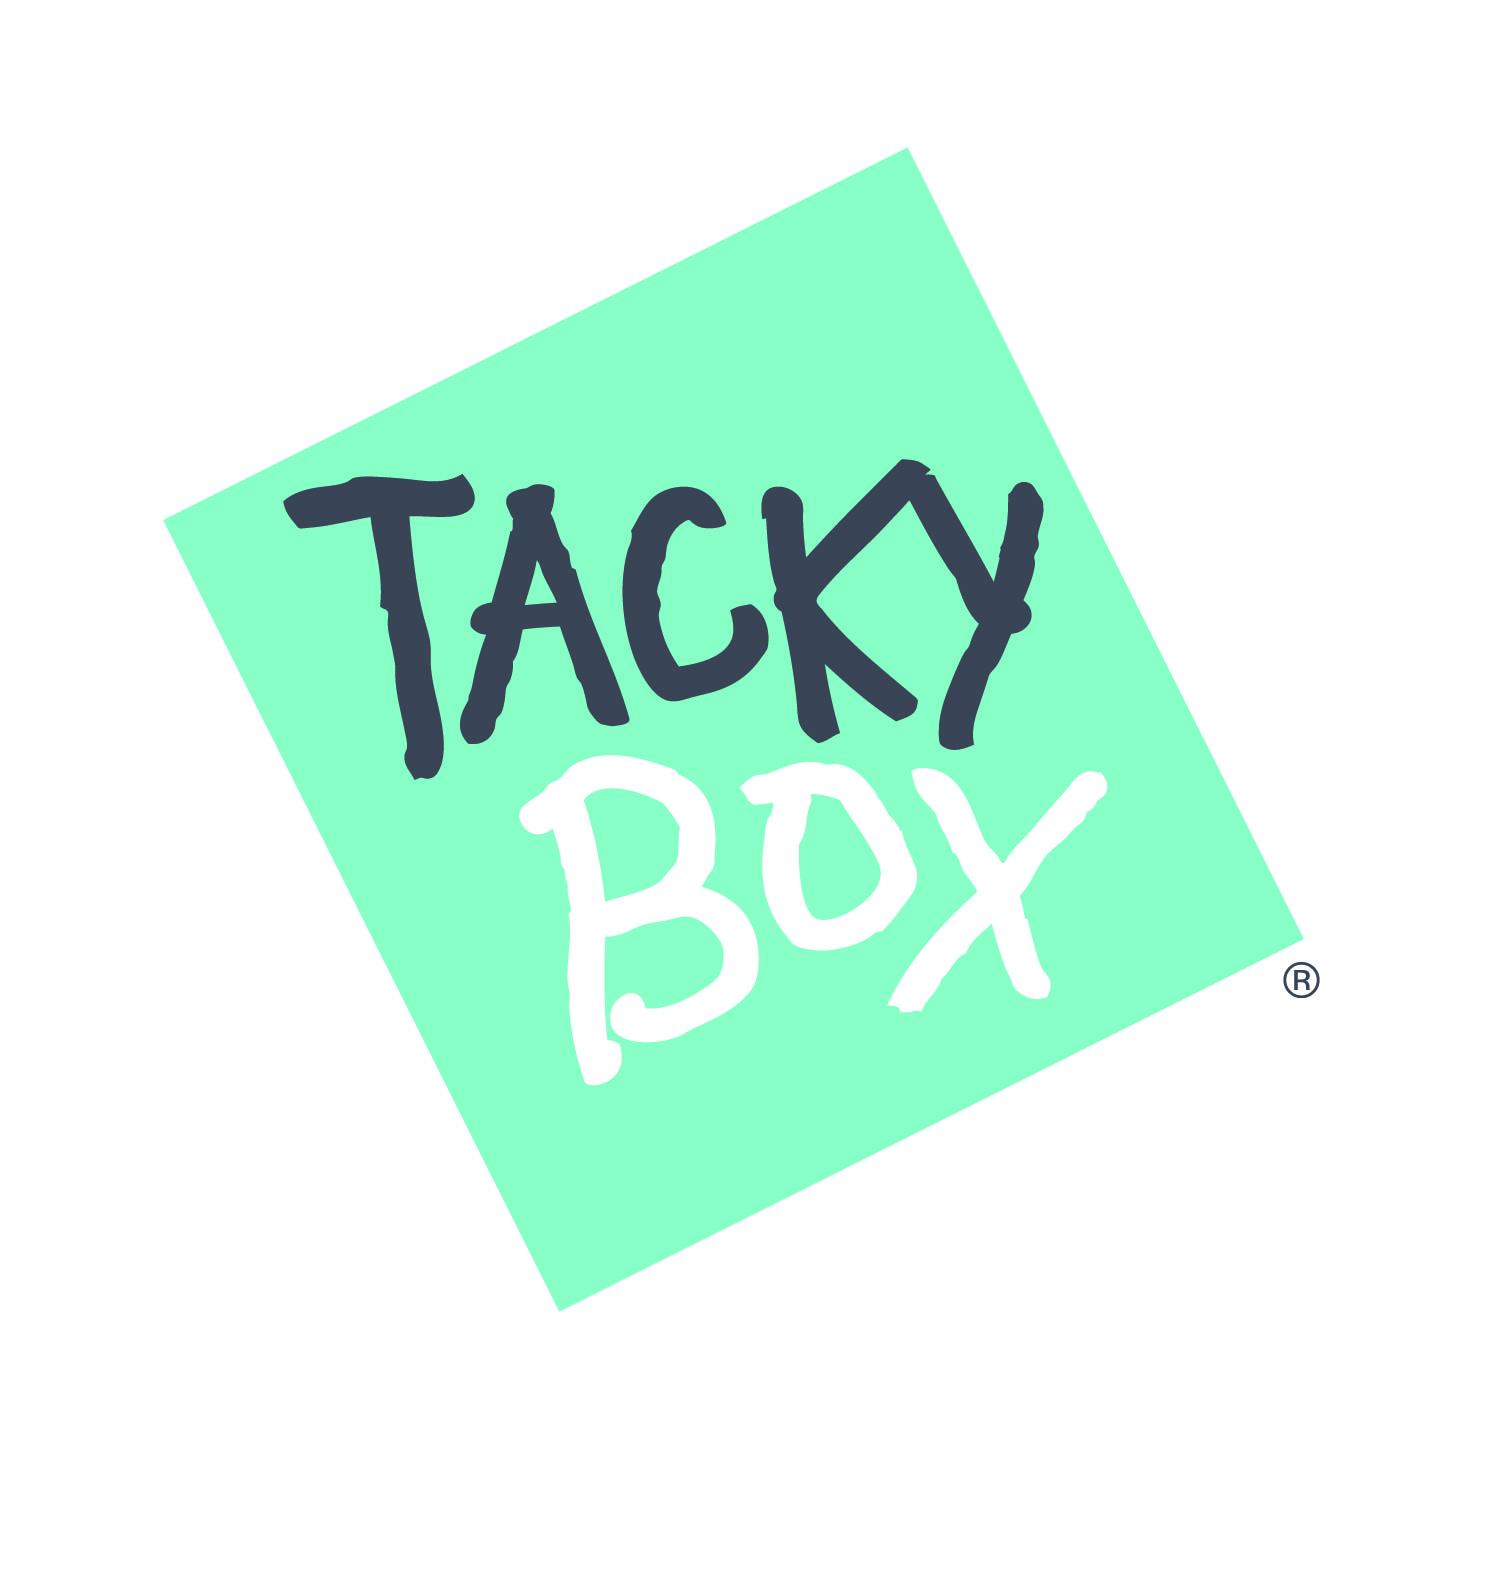 Tacky Box Logo-Final-CMYK.jpg